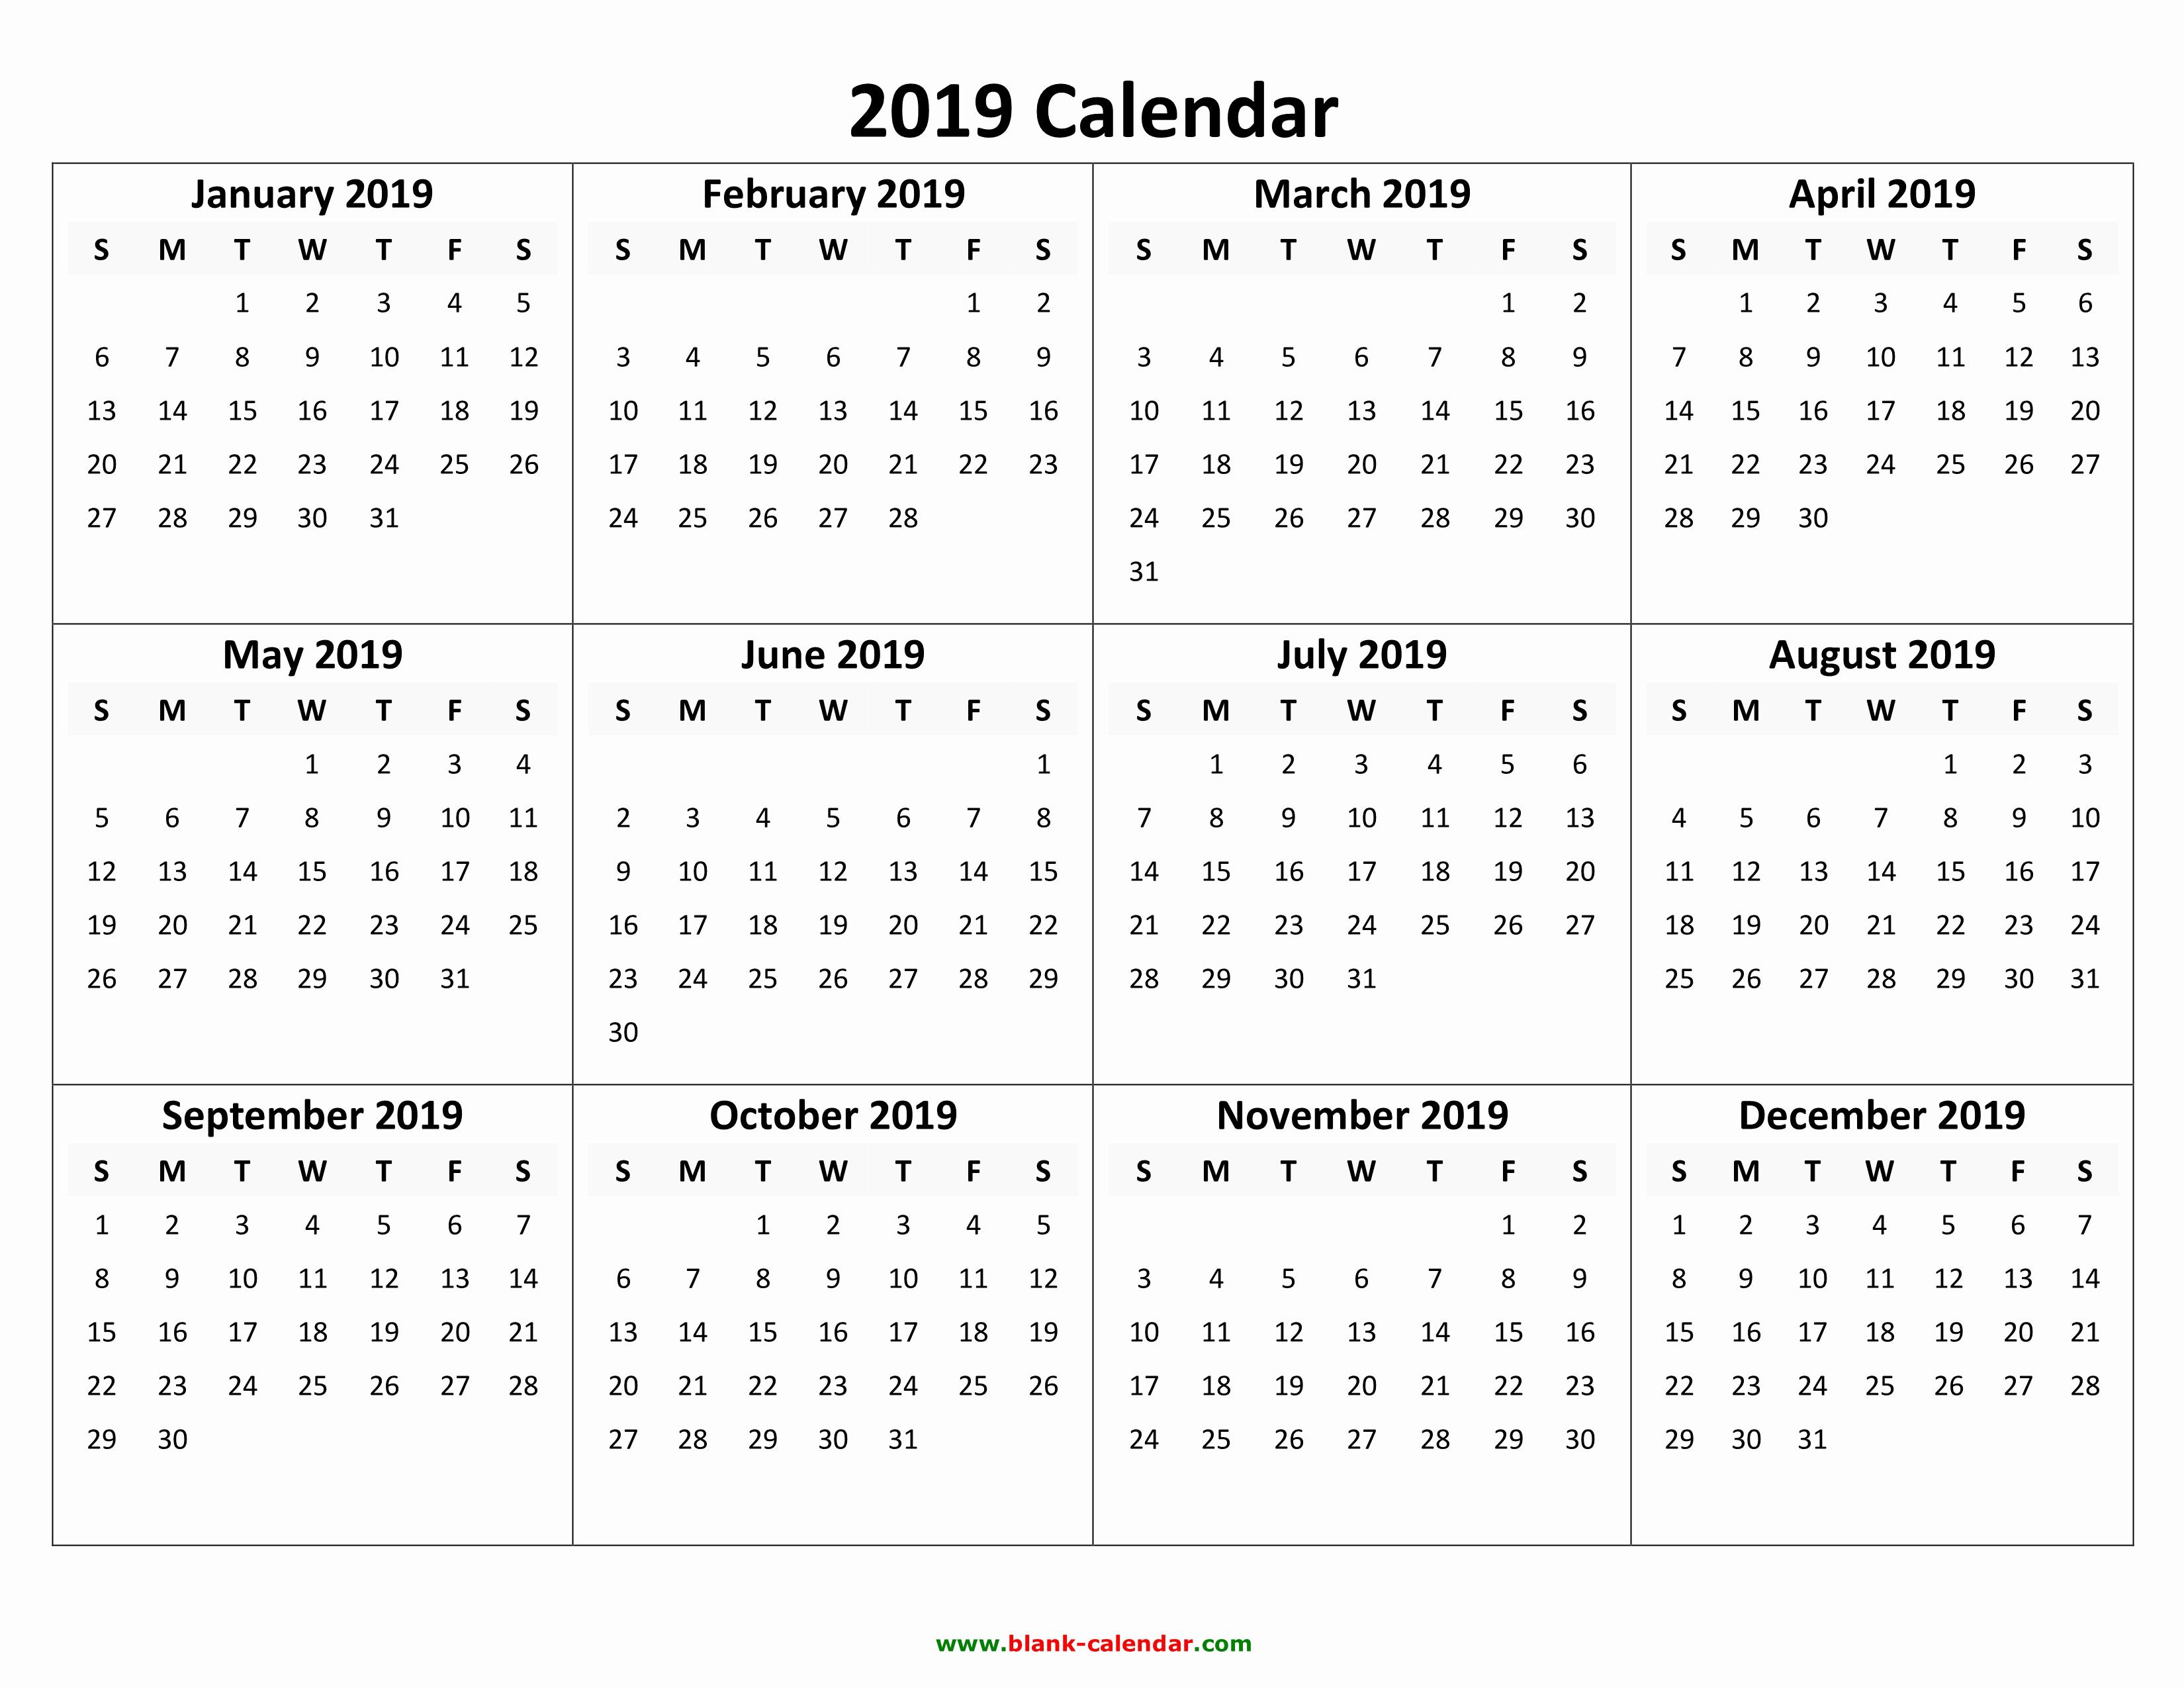 Blank Calendar Template 2019 Elegant Yearly Calendar 2019